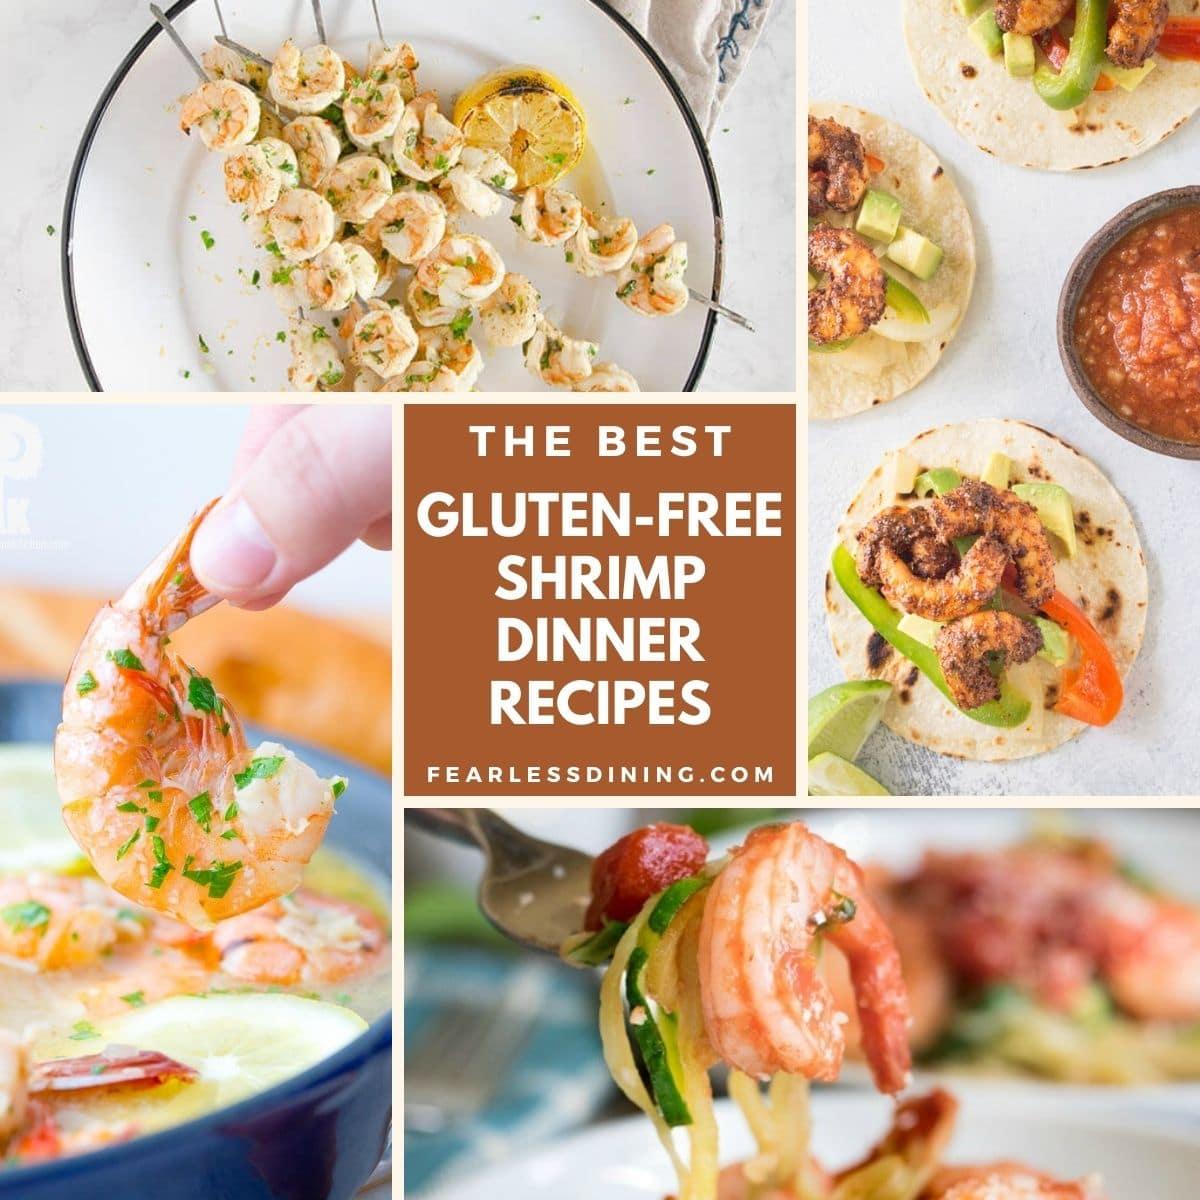 a collection of four shrimp recipe photos